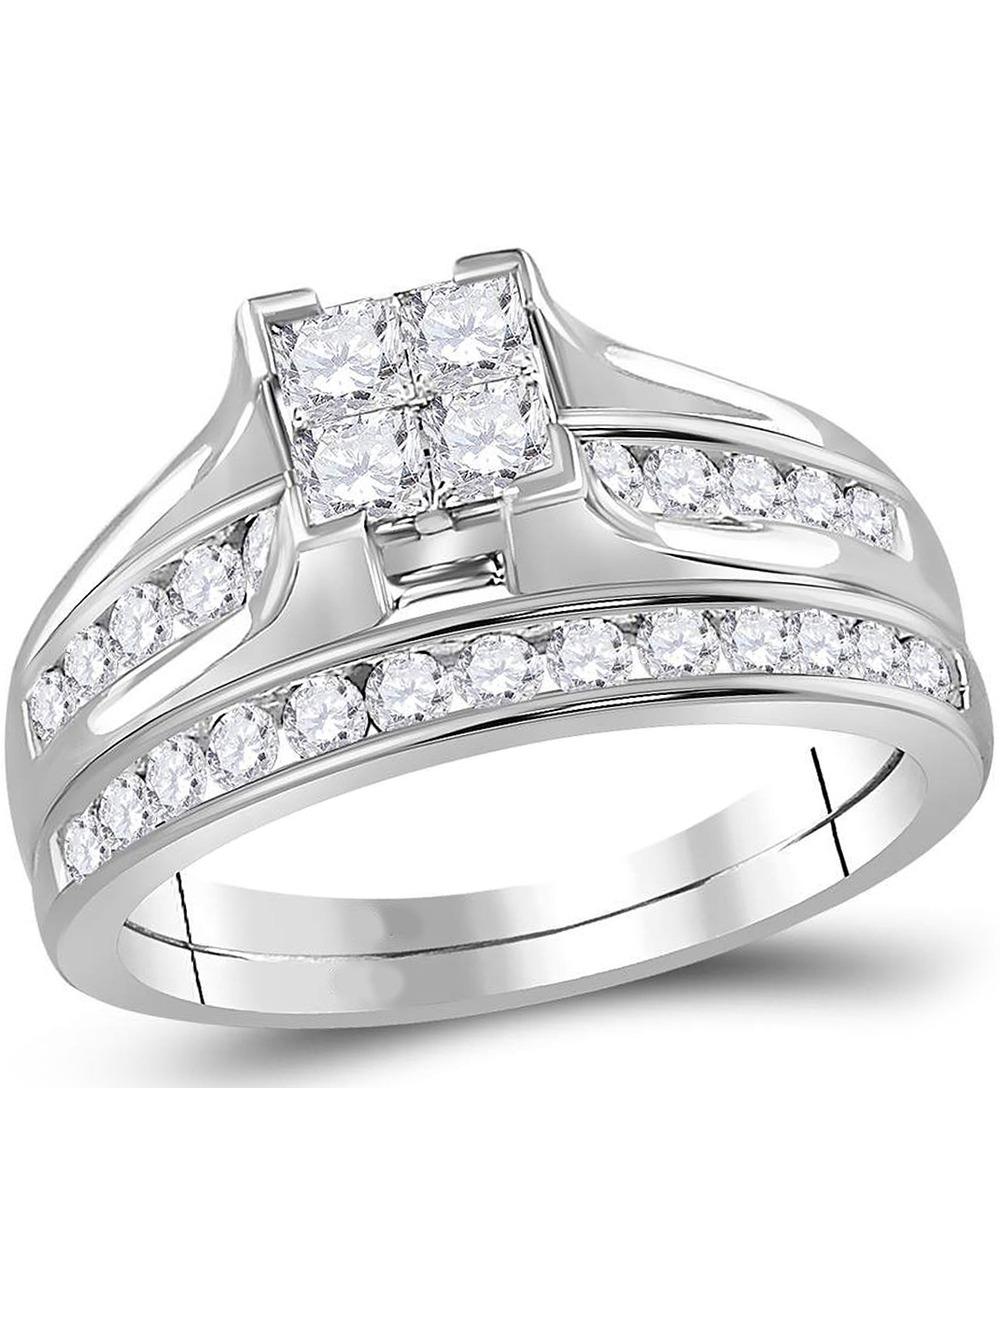 Princess Cut Diamond Engagement Ring Wedding Set 1 00 Carat Color